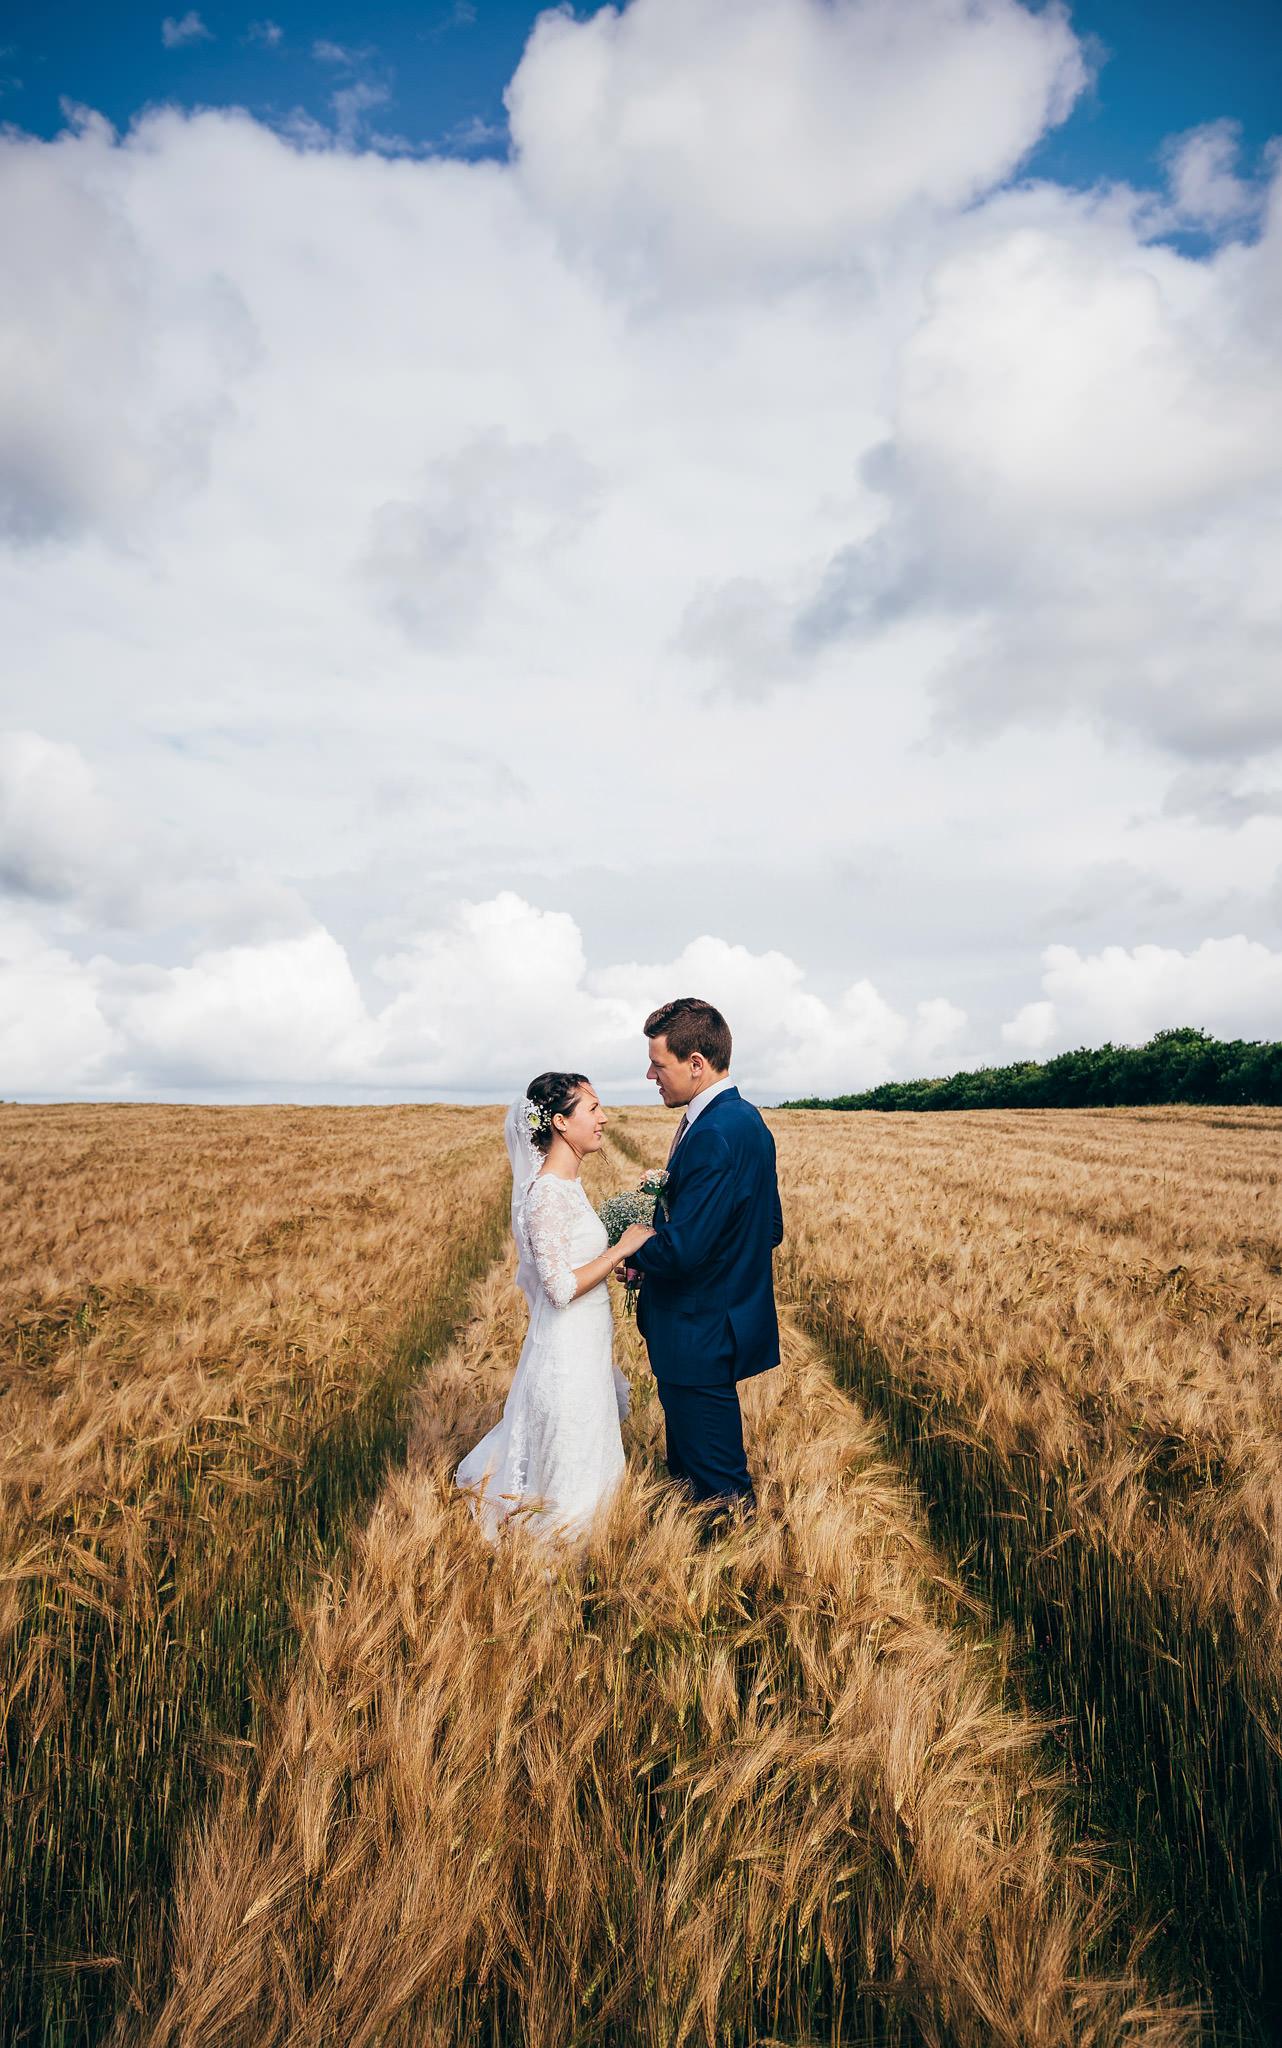 Norway+wedding+photographer+elopement+pre+wedding+Casey+Arneson-89.jpg